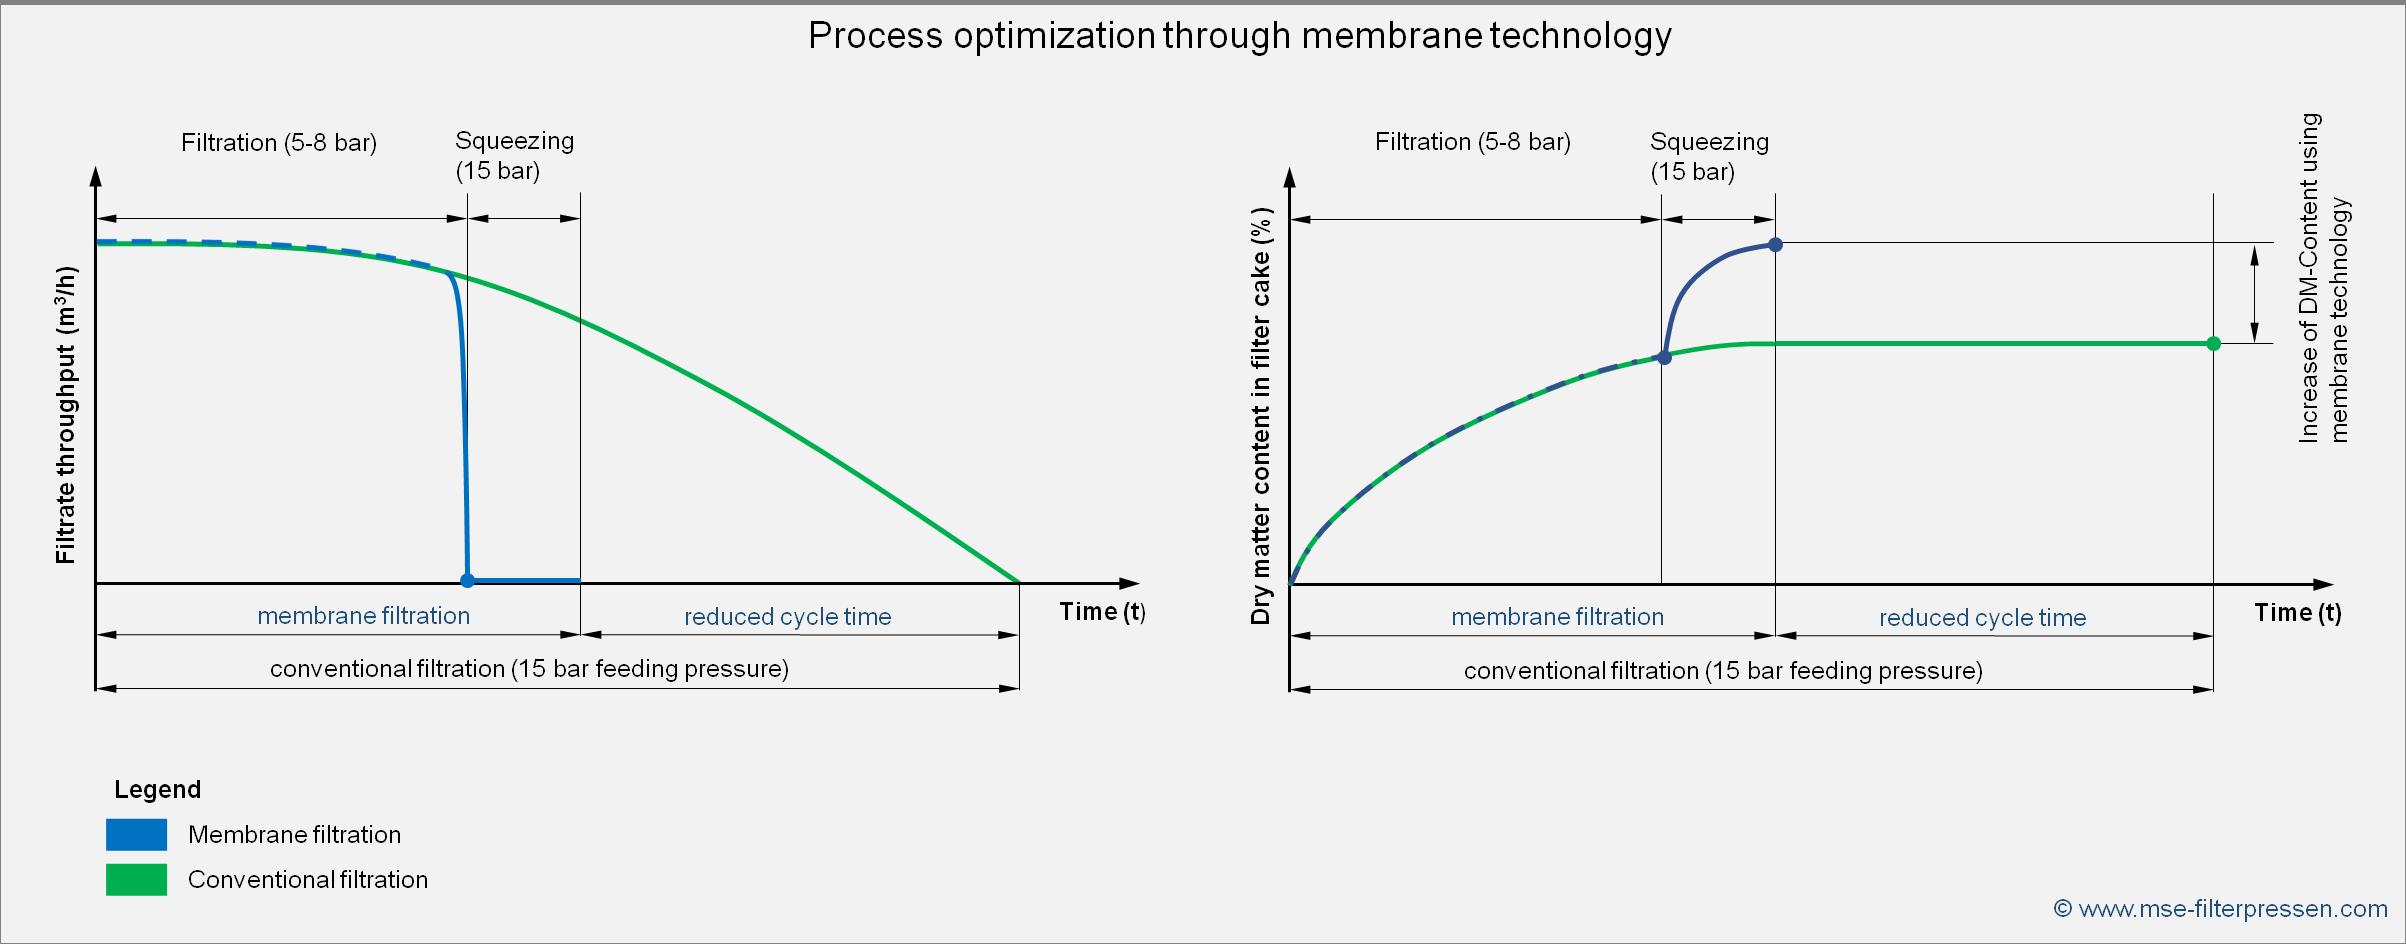 process optimization of a filter press by membrane technology